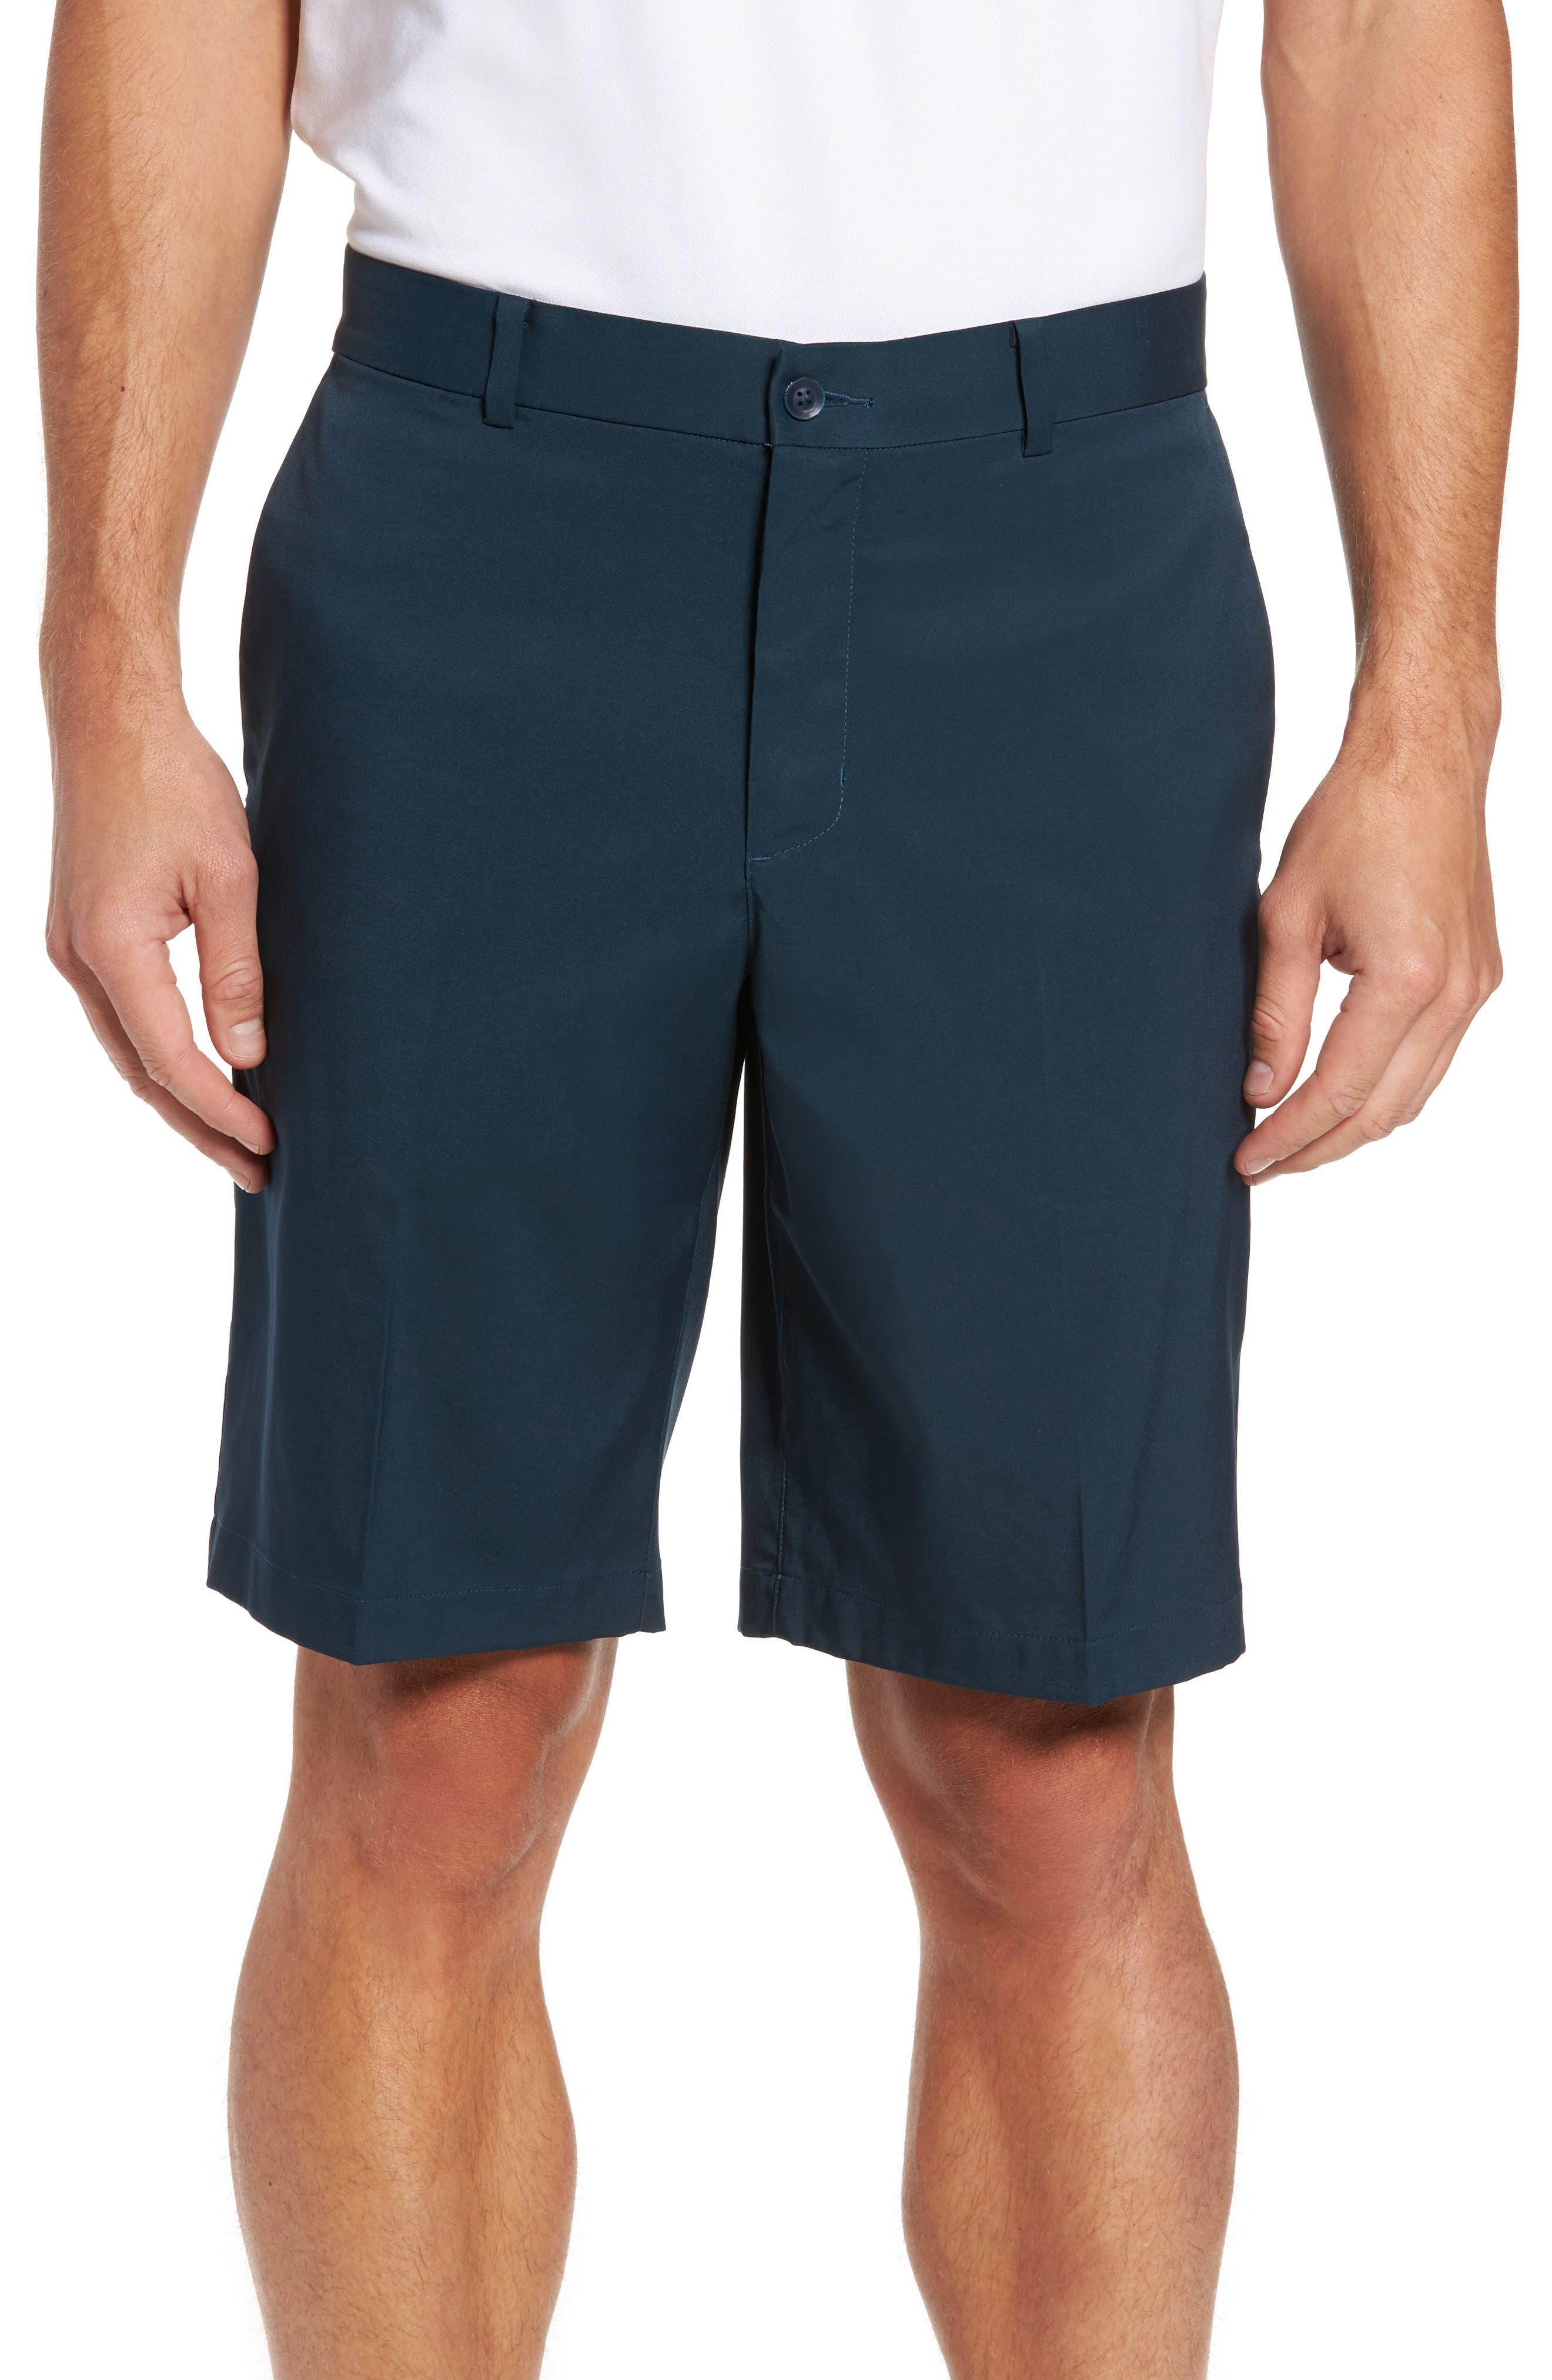 Nike Flat Front Golf Shorts